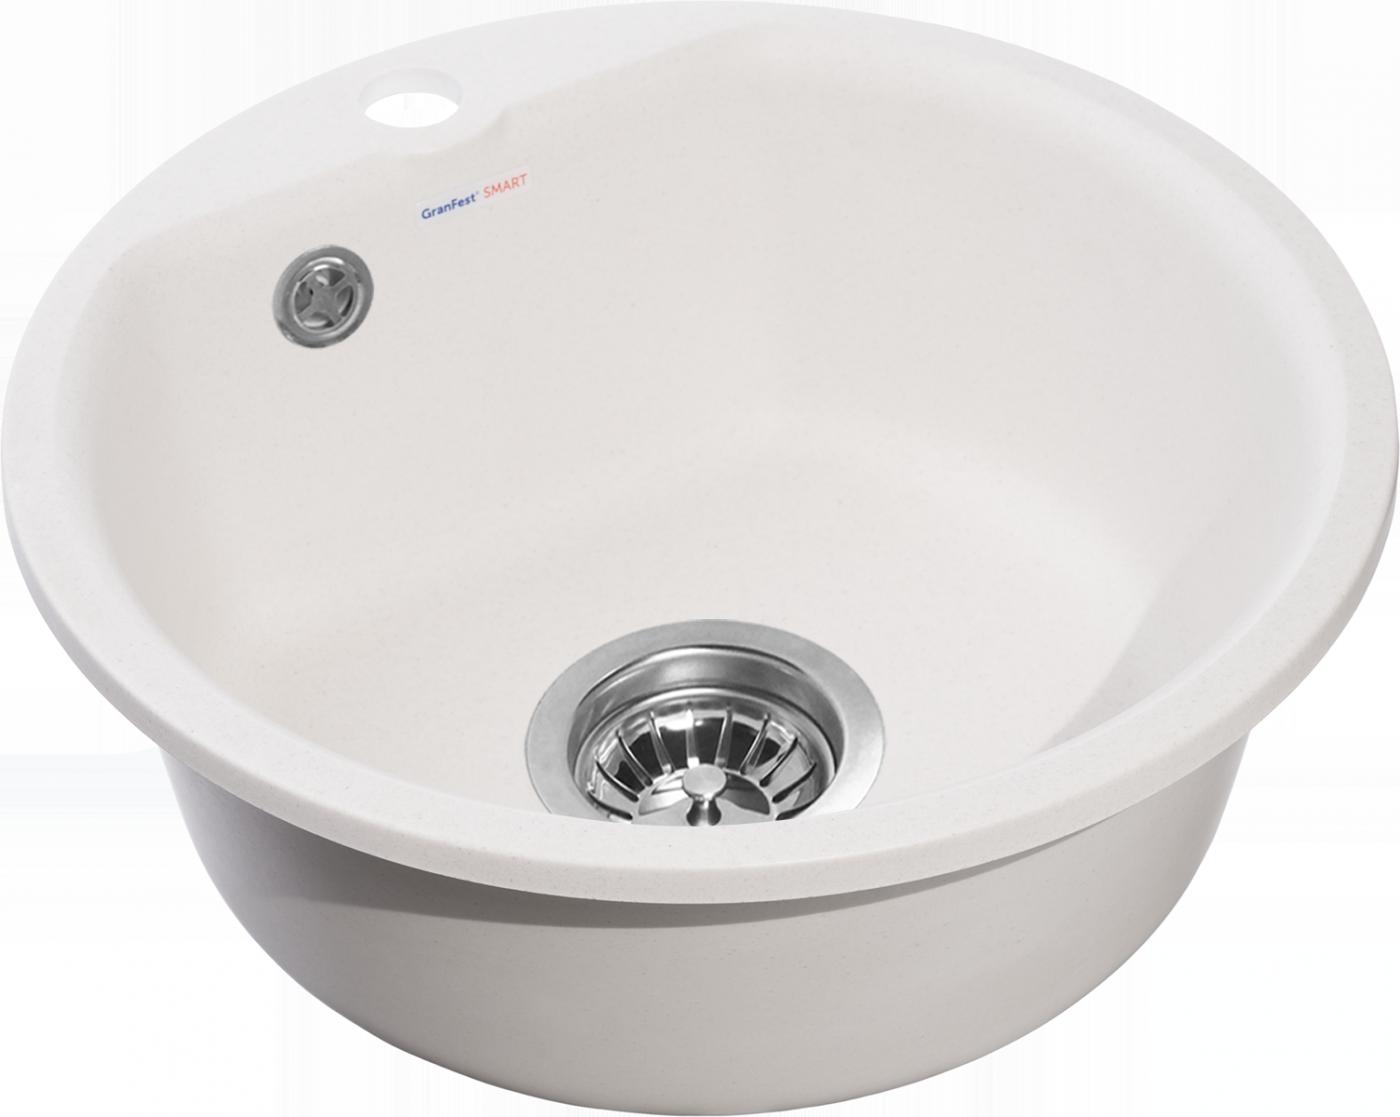 Мраморная мойка для кухни GranFest Smart SM435 Белый